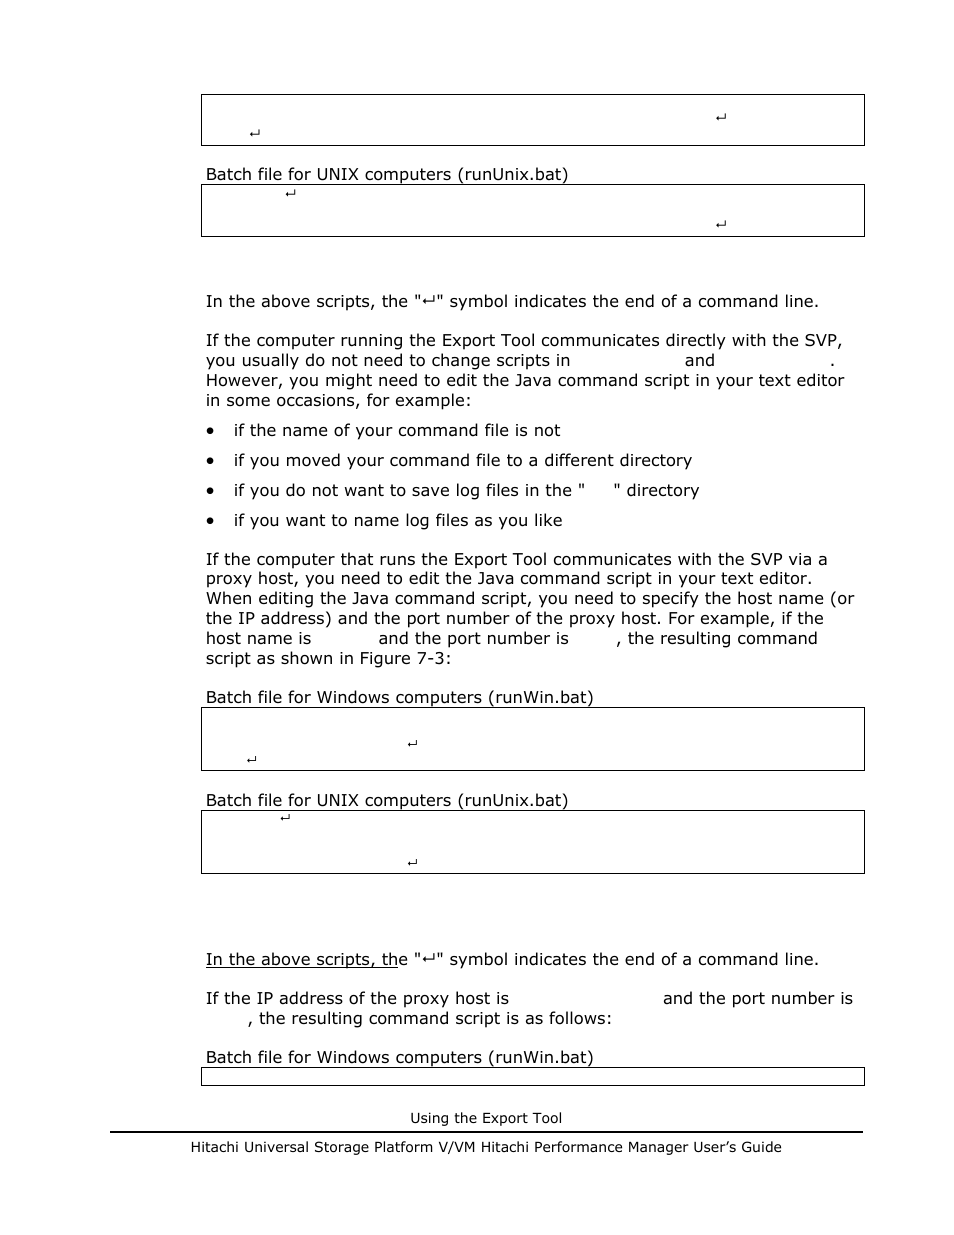 Figure 7-2 i   Hitachi MK-96RD617-08 User Manual   Page 187